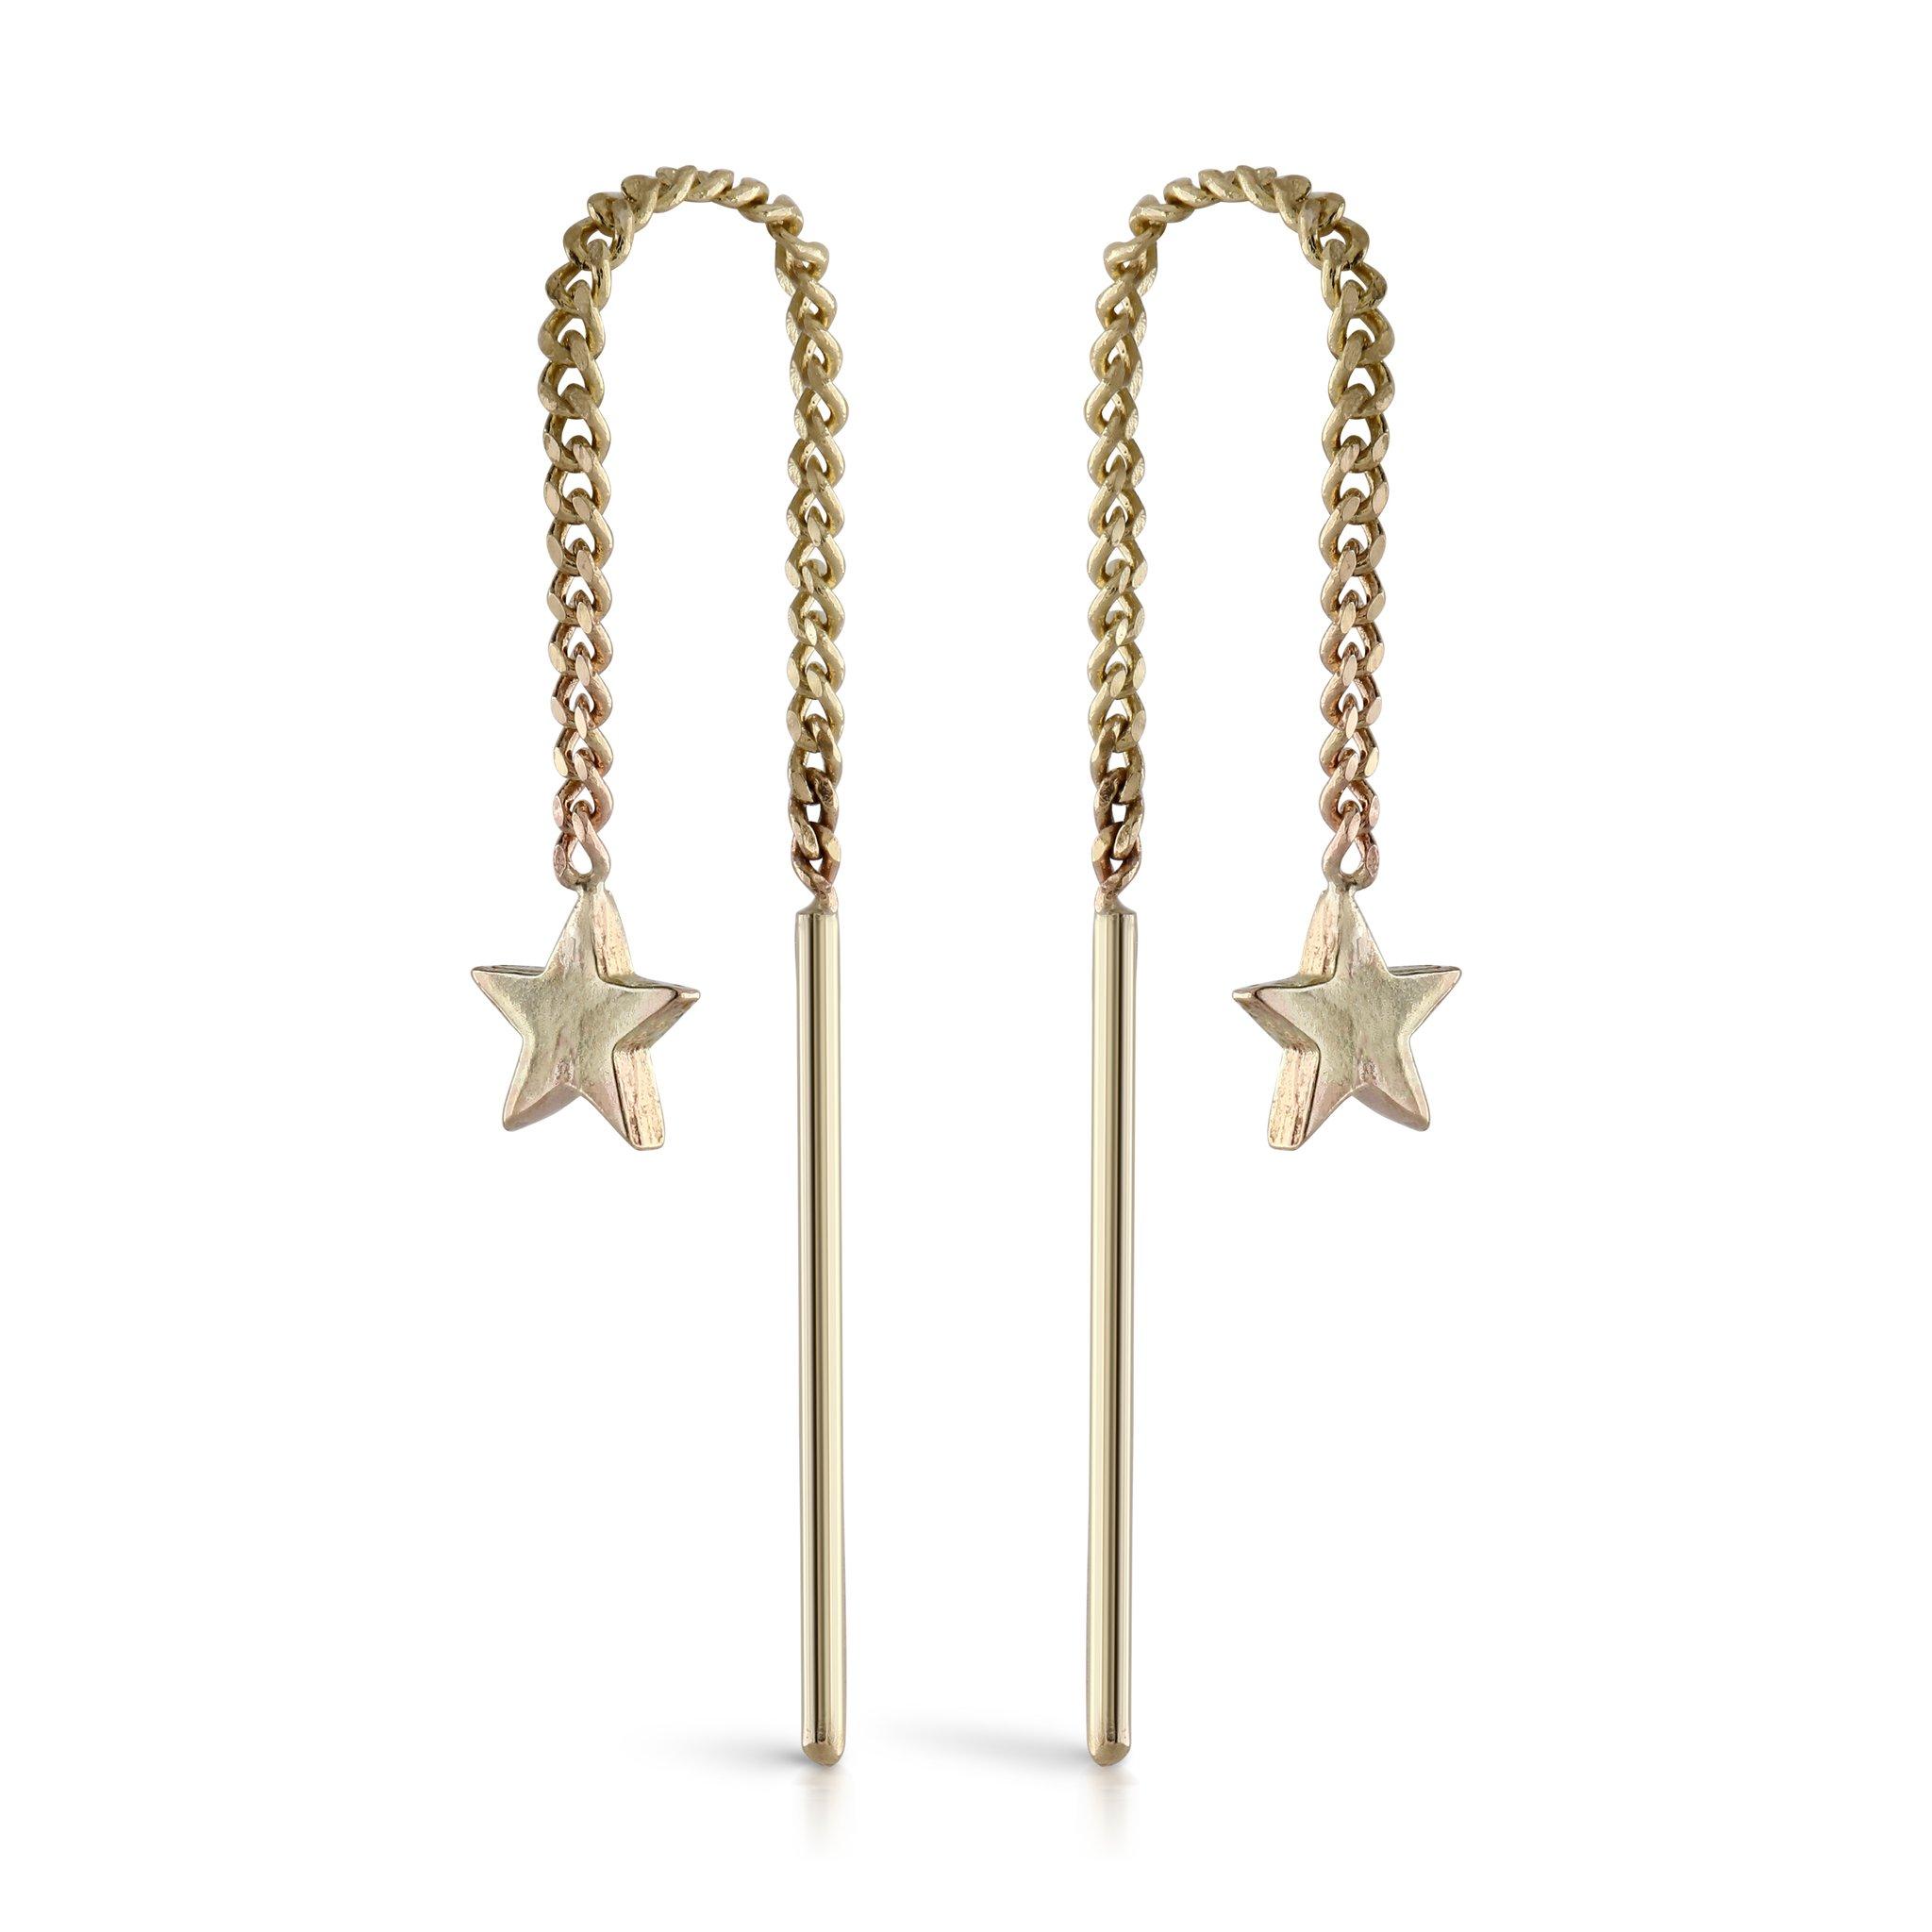 star-threader-earrings-gold-vermeil-pair-louise-wade